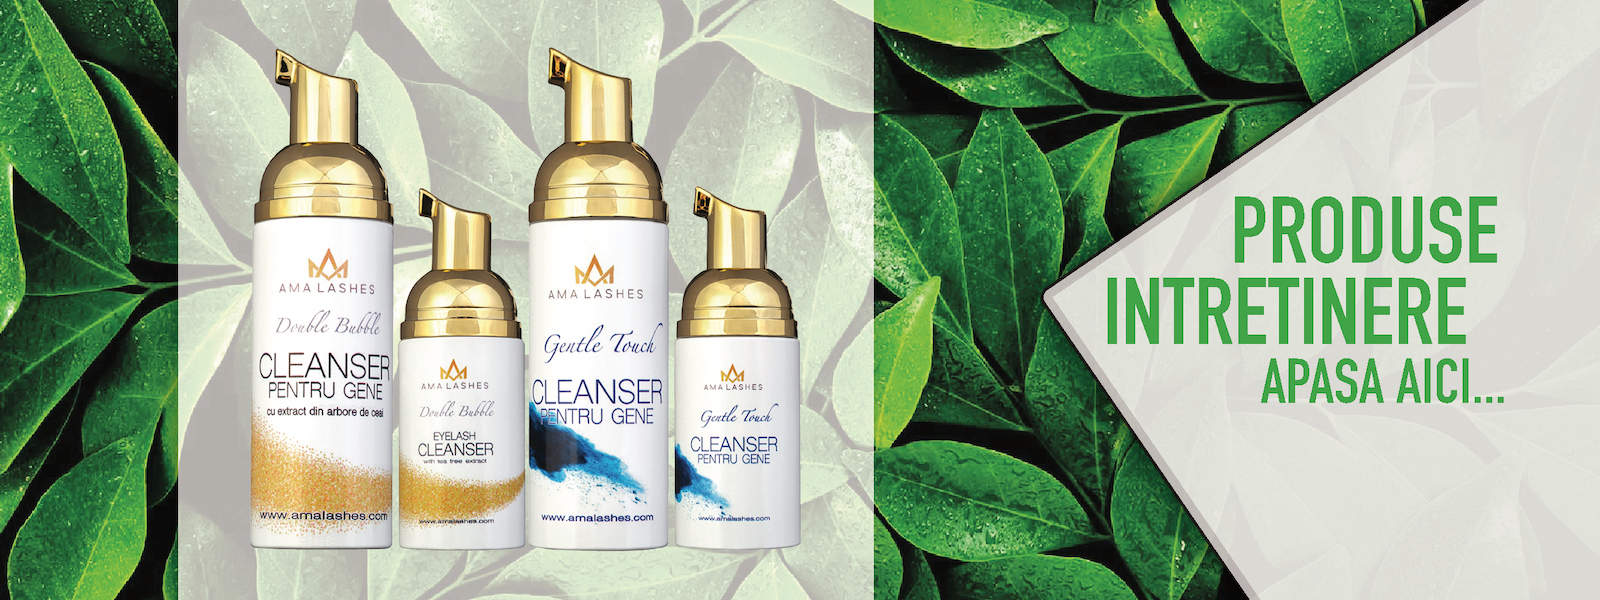 Cleanser-Sampon-Gene-Produse-Intretinere-Extensii-Gene-AMA-Lashes